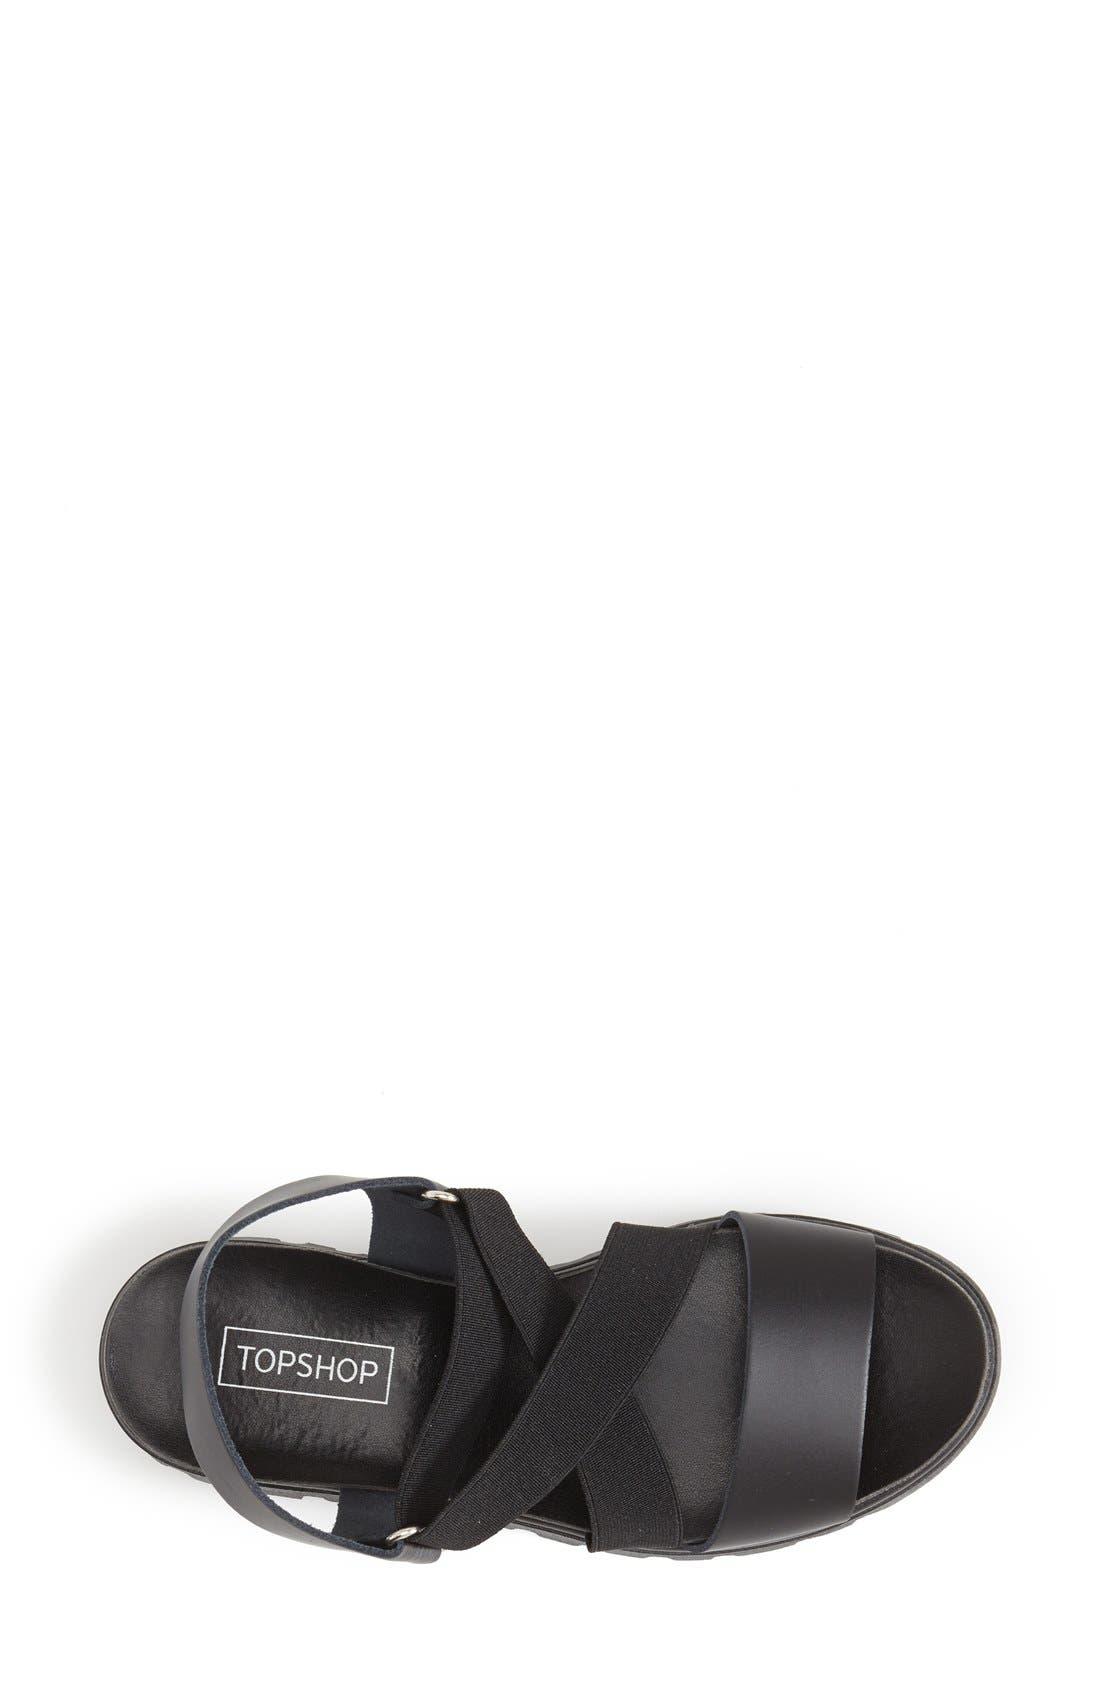 Alternate Image 3  - Topshop 'Folly' Strappy Platform Sandal (Women)